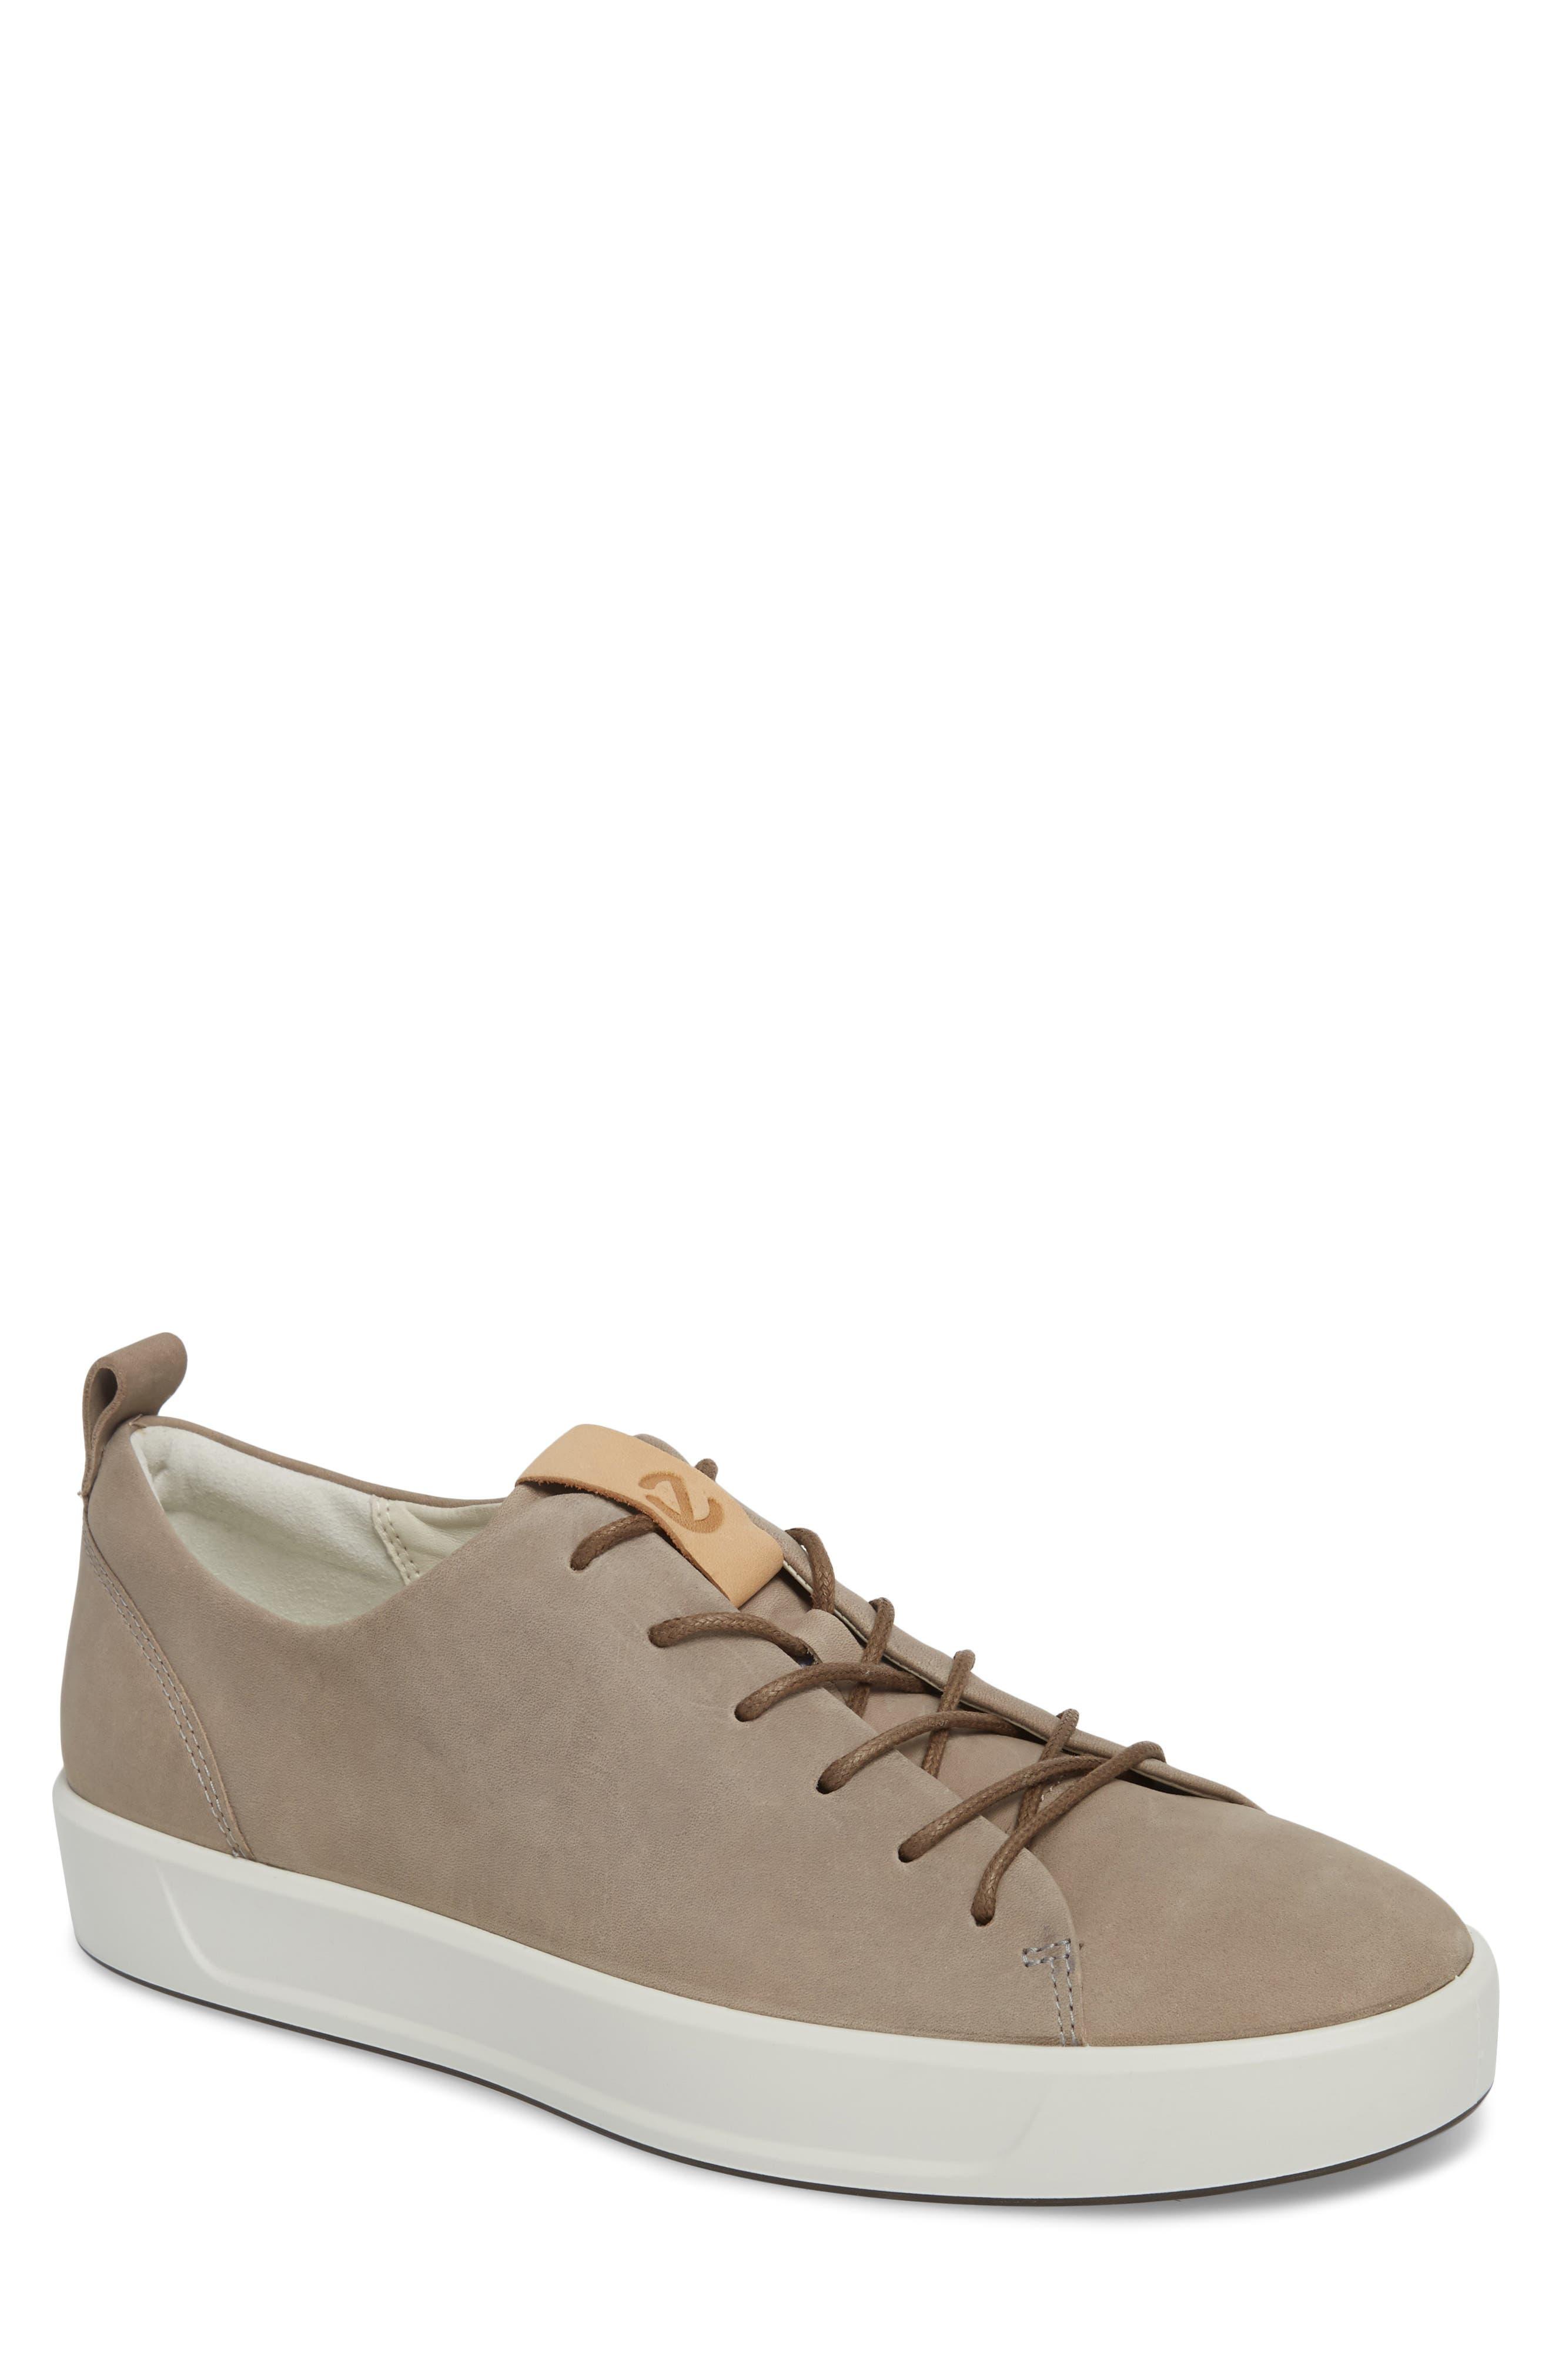 Ecco Soft 8 Sneaker, Grey